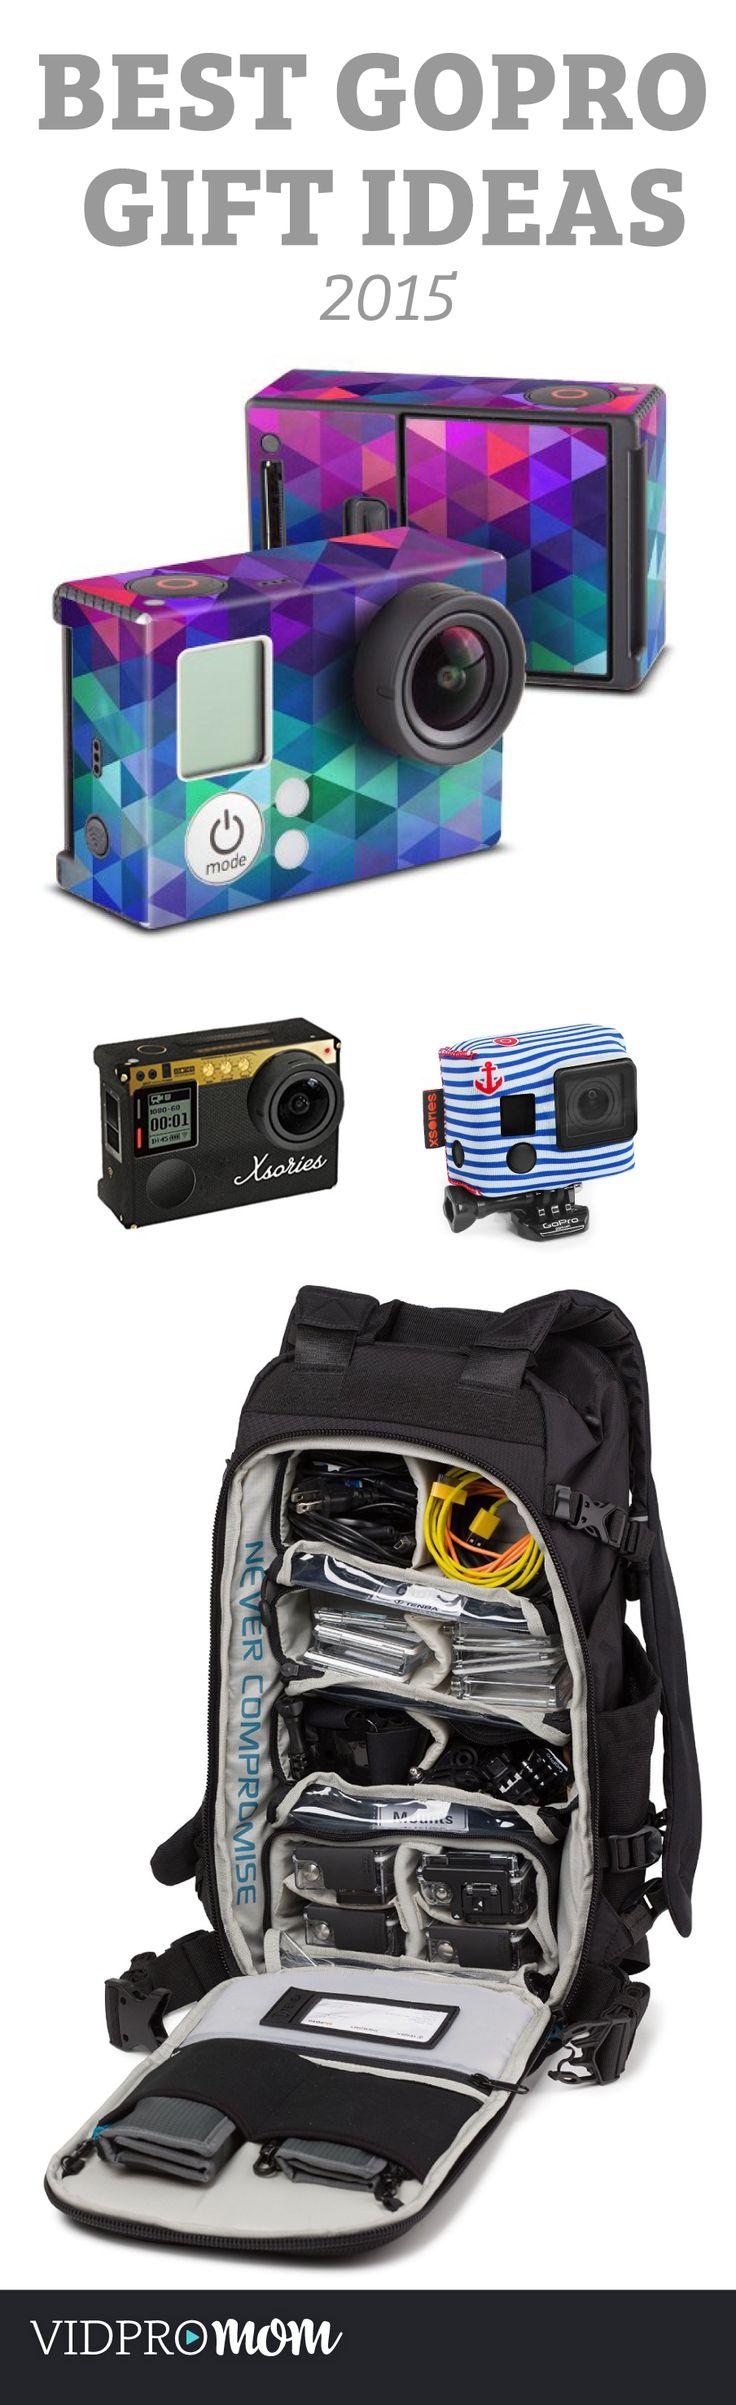 Best GoPro Gifts 2015 - VidProMom